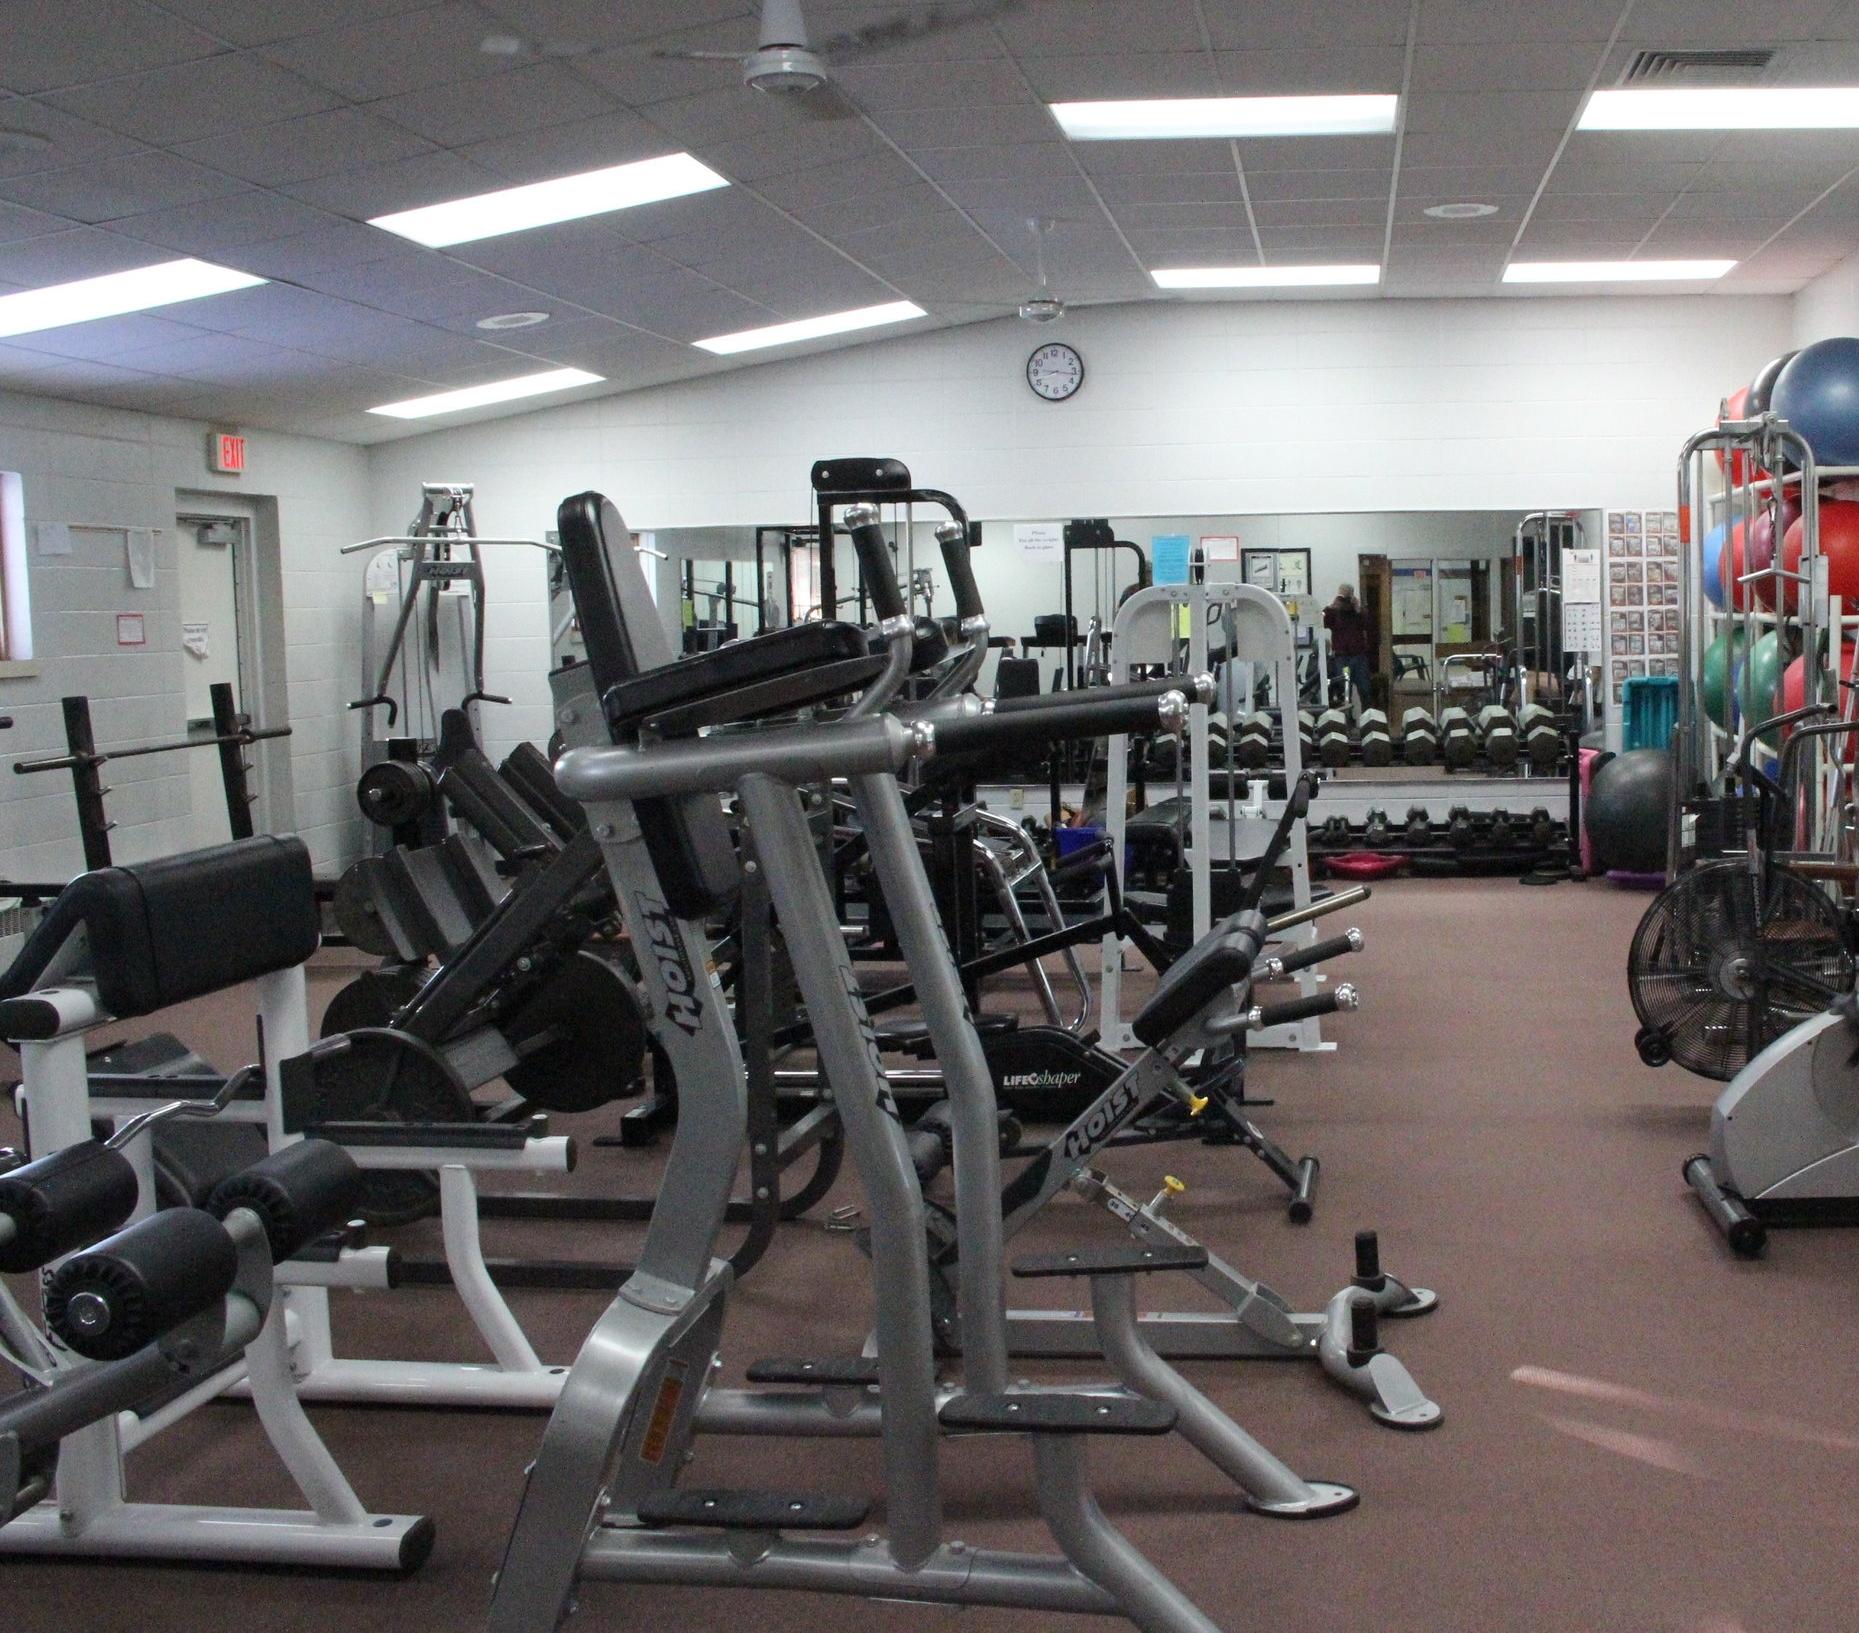 Mosling_Recreation_Center_Weight_Room.JPG